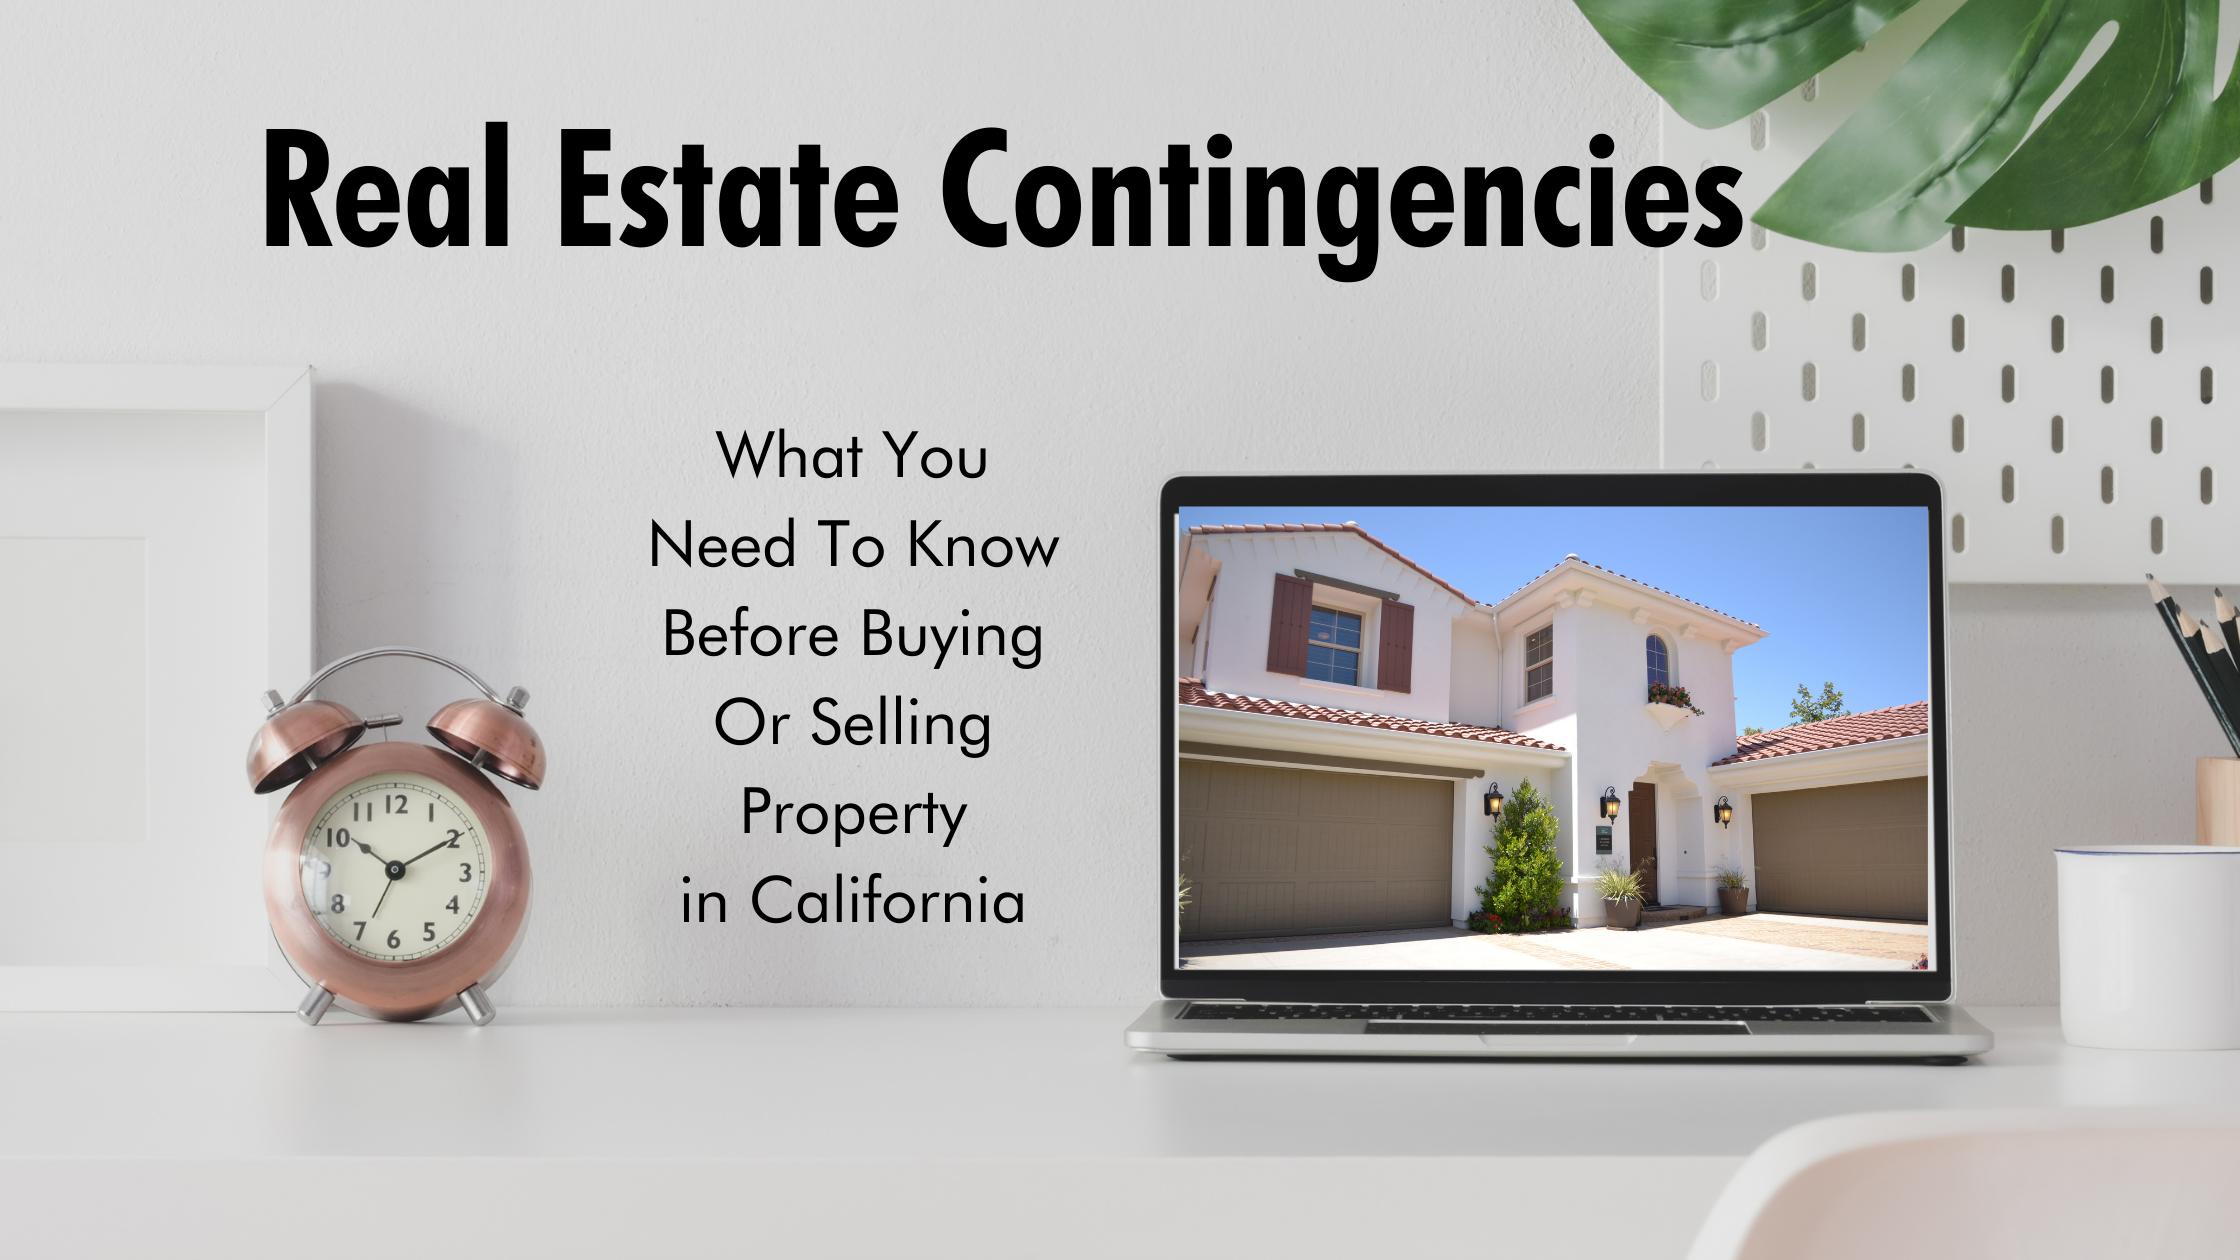 Real Estate Contingencies